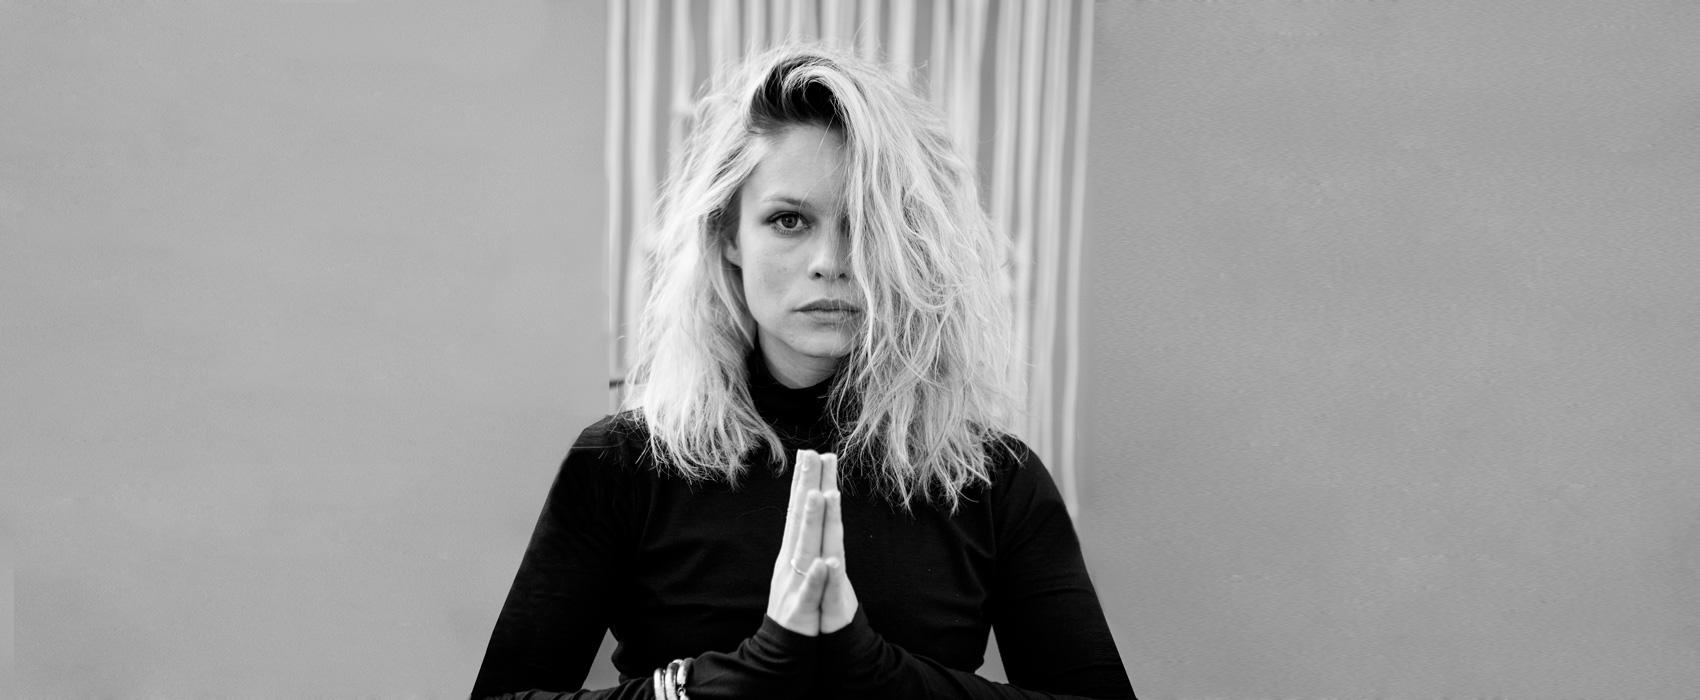 O.MY.YOGA–ULM, Anna Altrichter Yoga Lehrerin Ashtanga/Hatha und RYT500h aus Ulm. Yoga Kurse für Asthanga, Vinyasa und Hatha. Yoga Kurse für Firmen, Kooperationen mit Firmen.